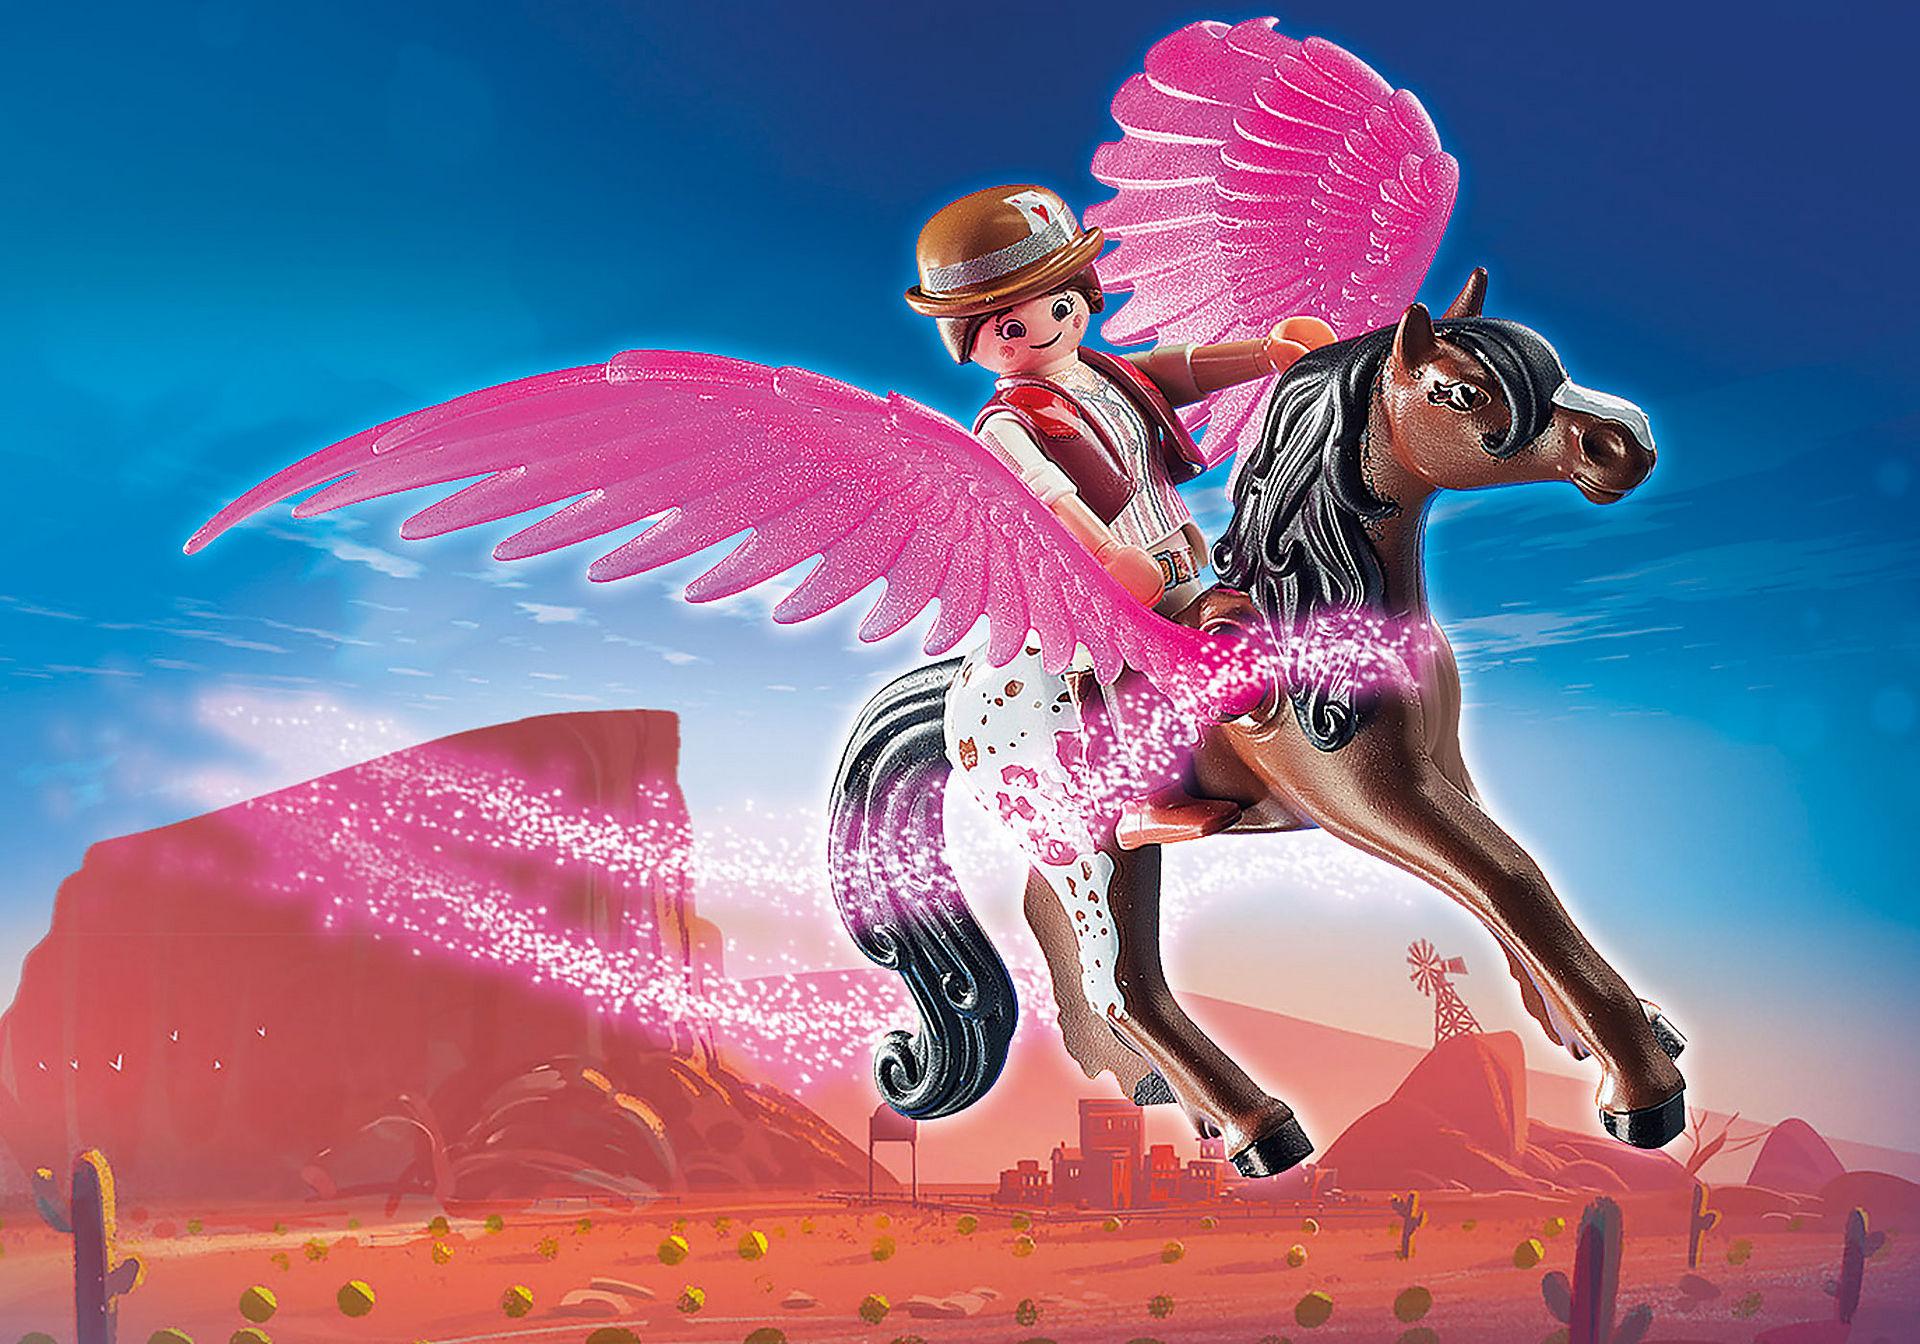 http://media.playmobil.com/i/playmobil/70074_product_extra1/PLAYMOBIL: THE MOVIE Marla et Del avec cheval ailé